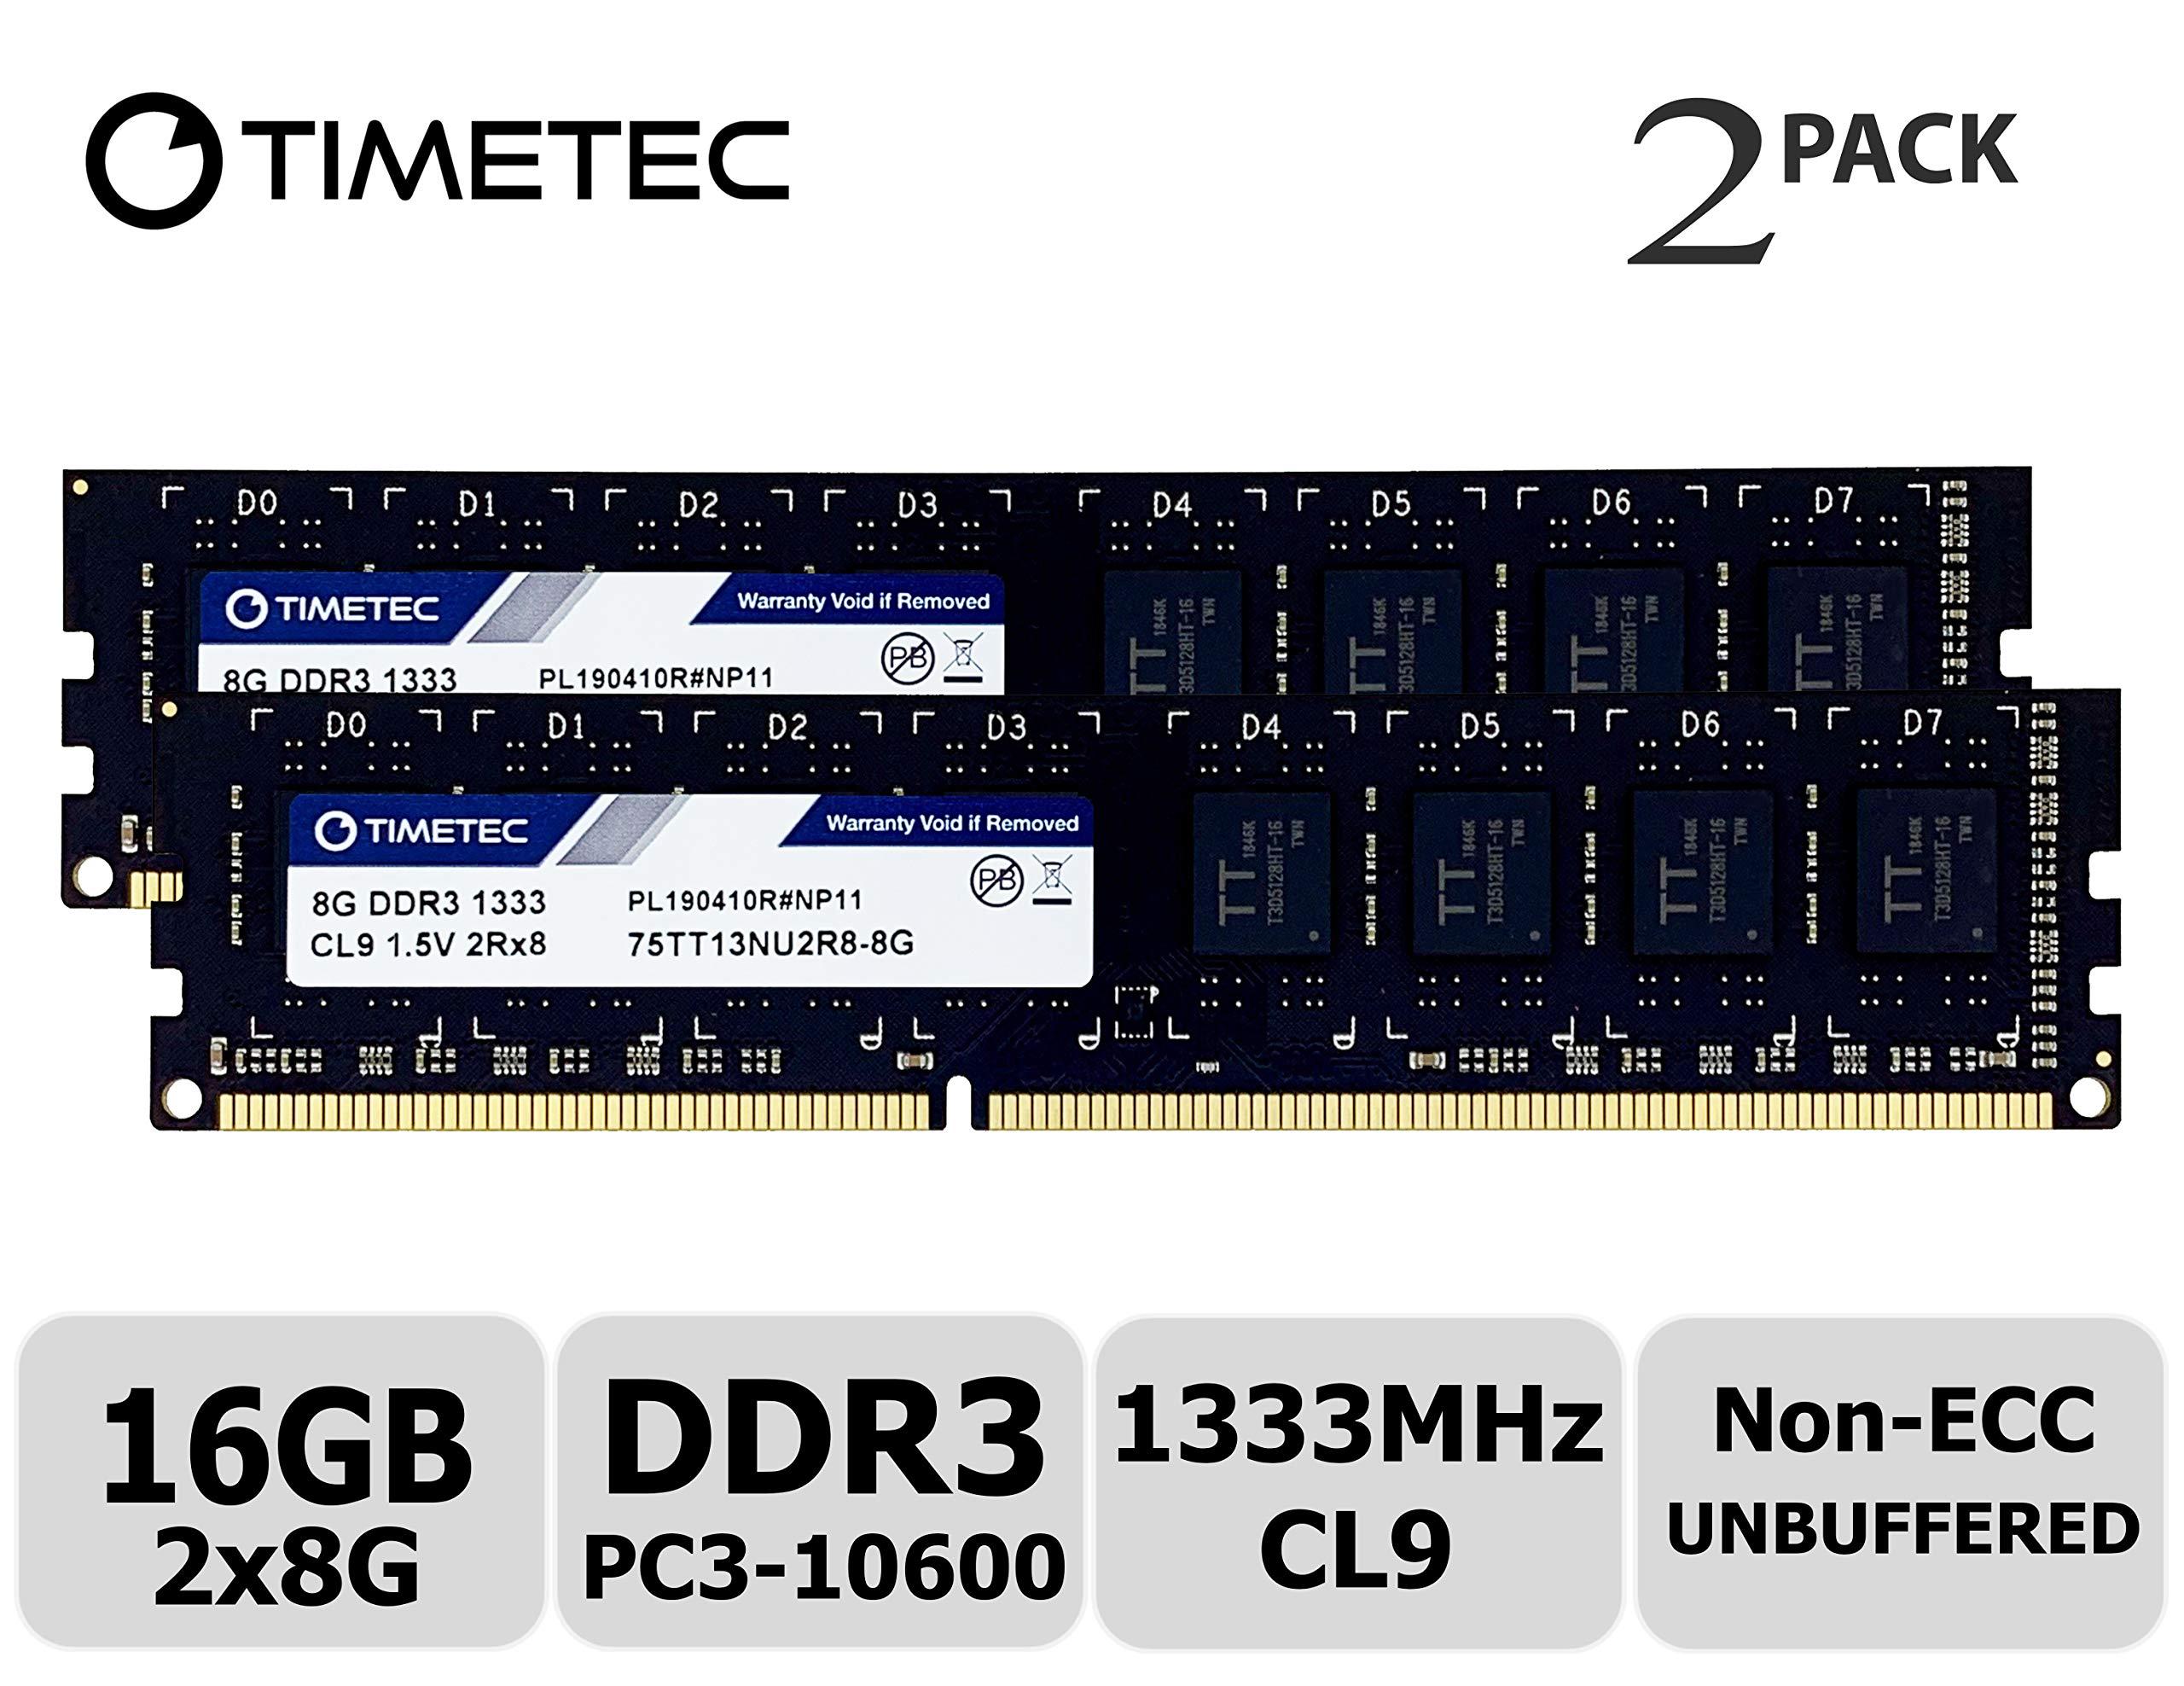 Memoria Ram 16gb Timetec Hynix Ic Kit (2x8gb) Ddr3 1333mhz Pc3-10600 Unbuffered Non-ecc 1.5v Cl9 2rx8 Dual Rank 240 Pin